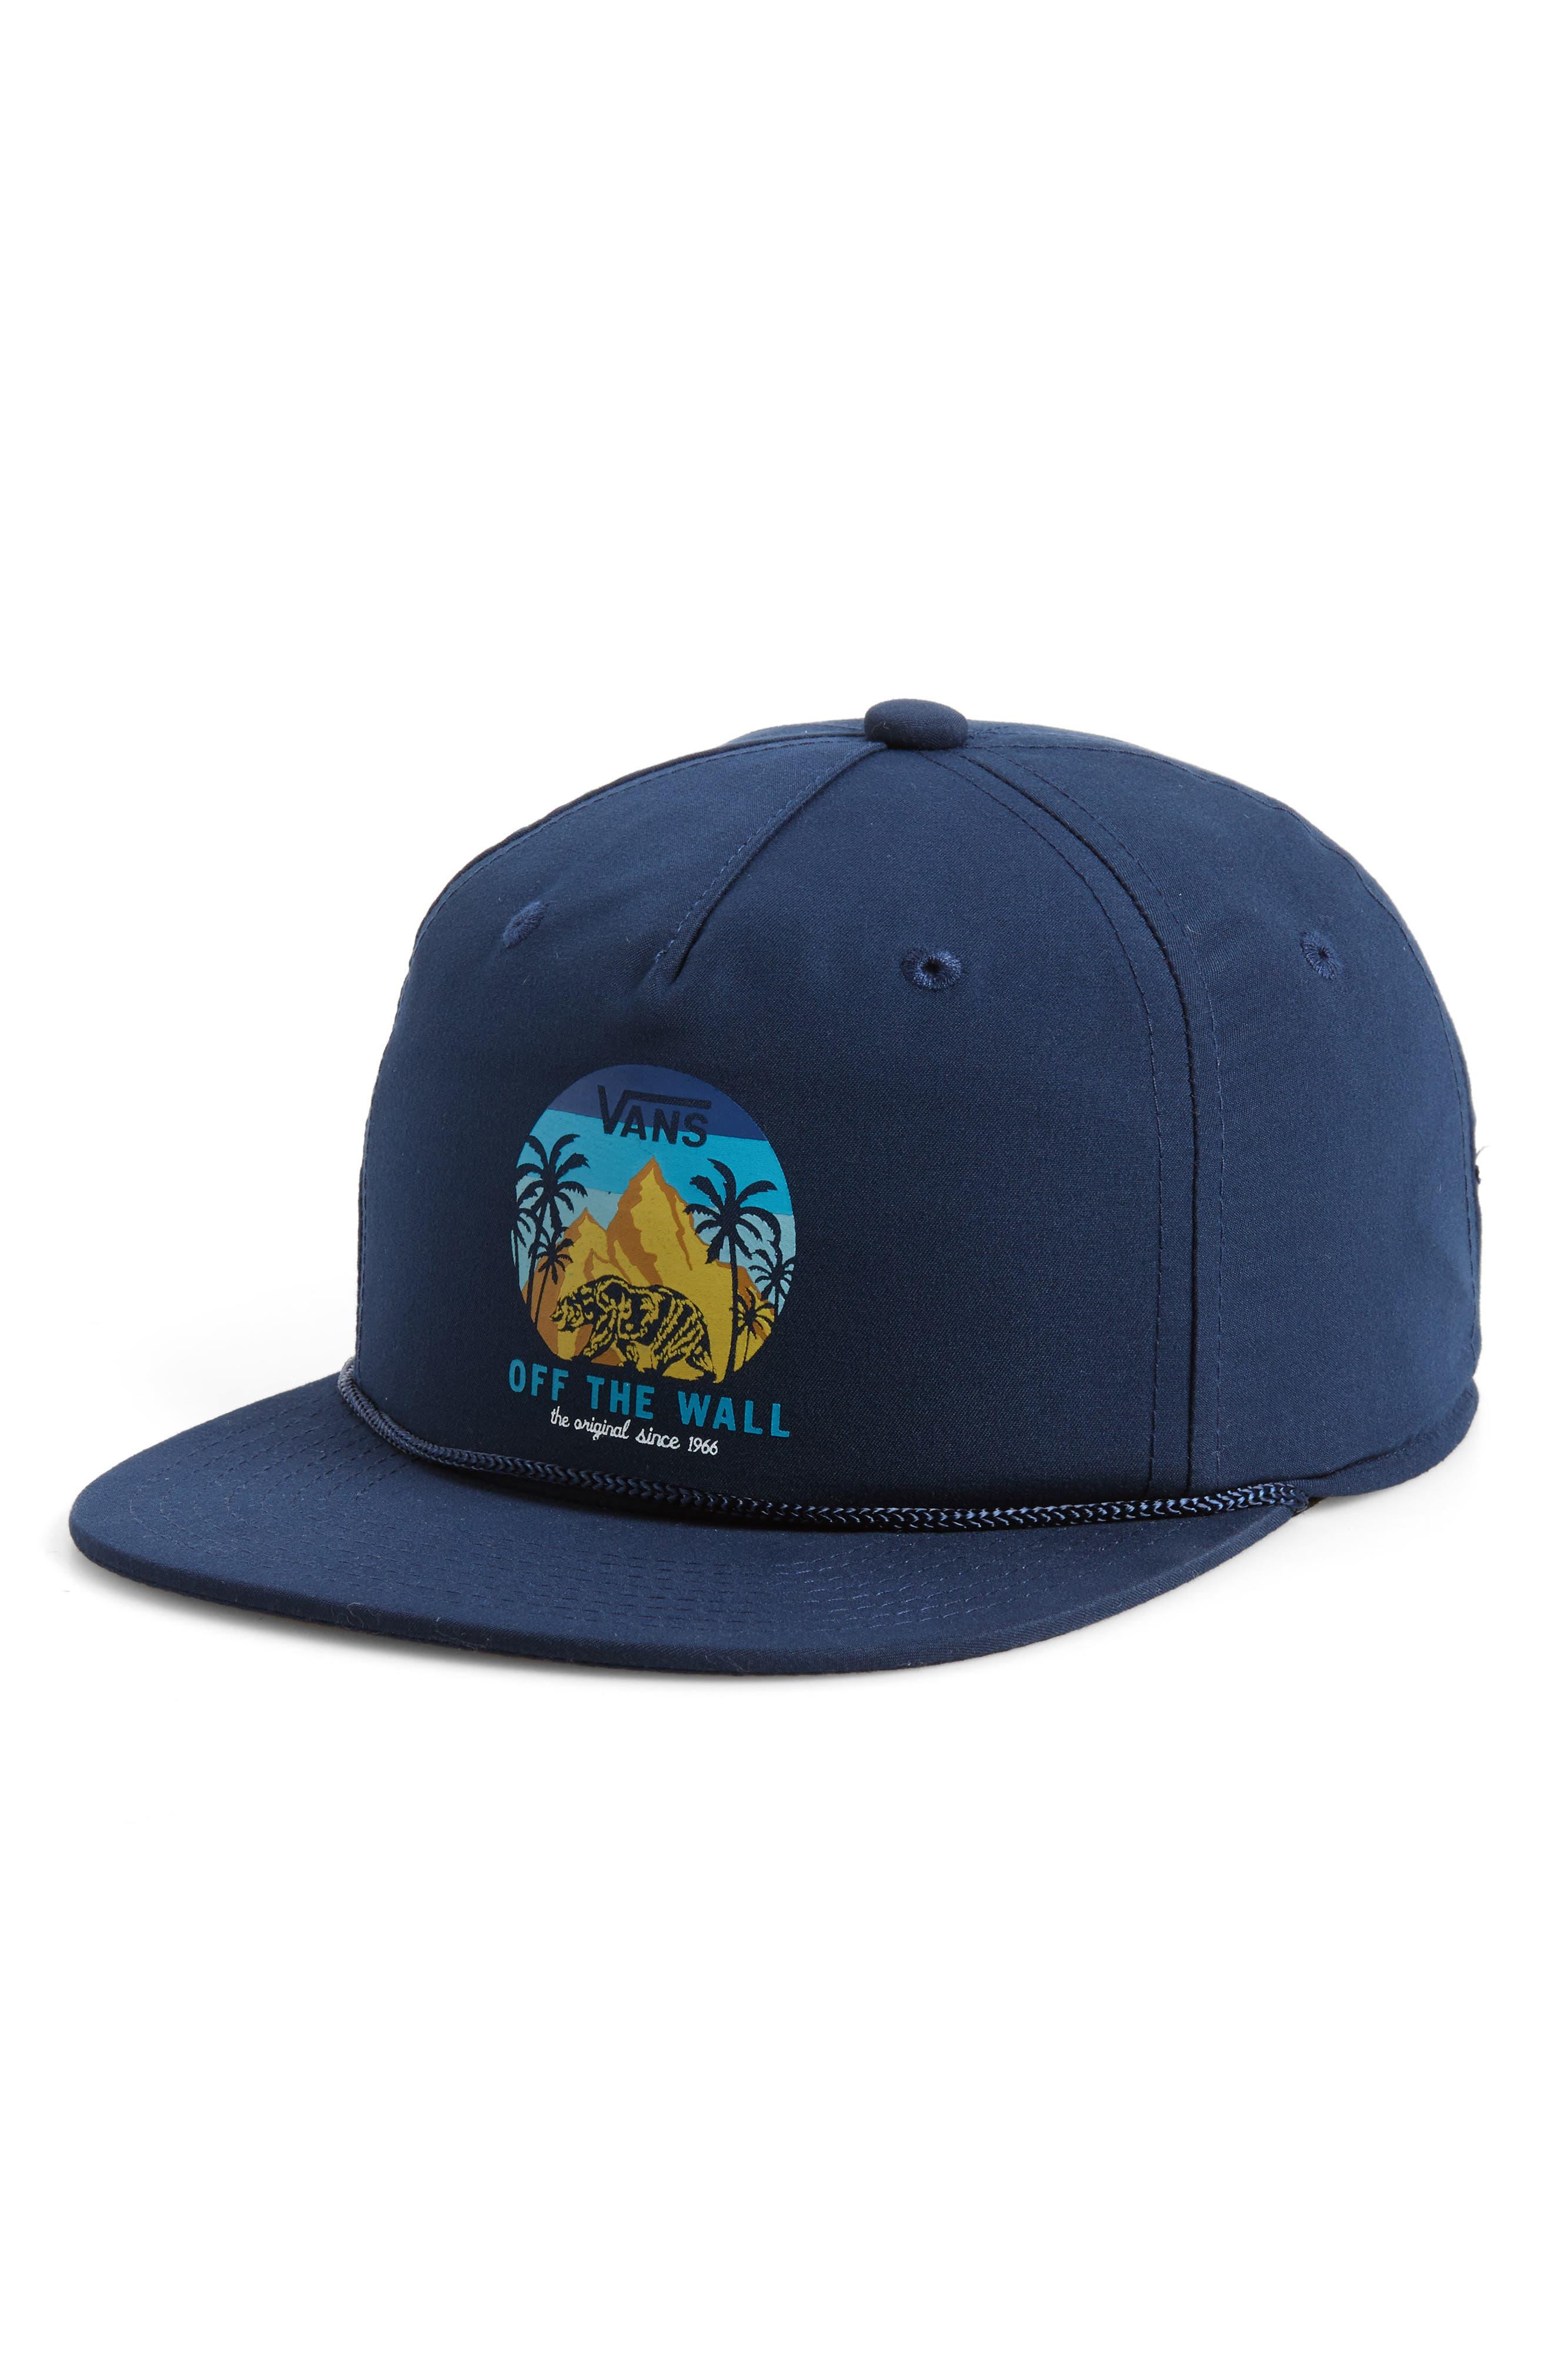 VANS California Dreamin Unstructured Snapback Hat